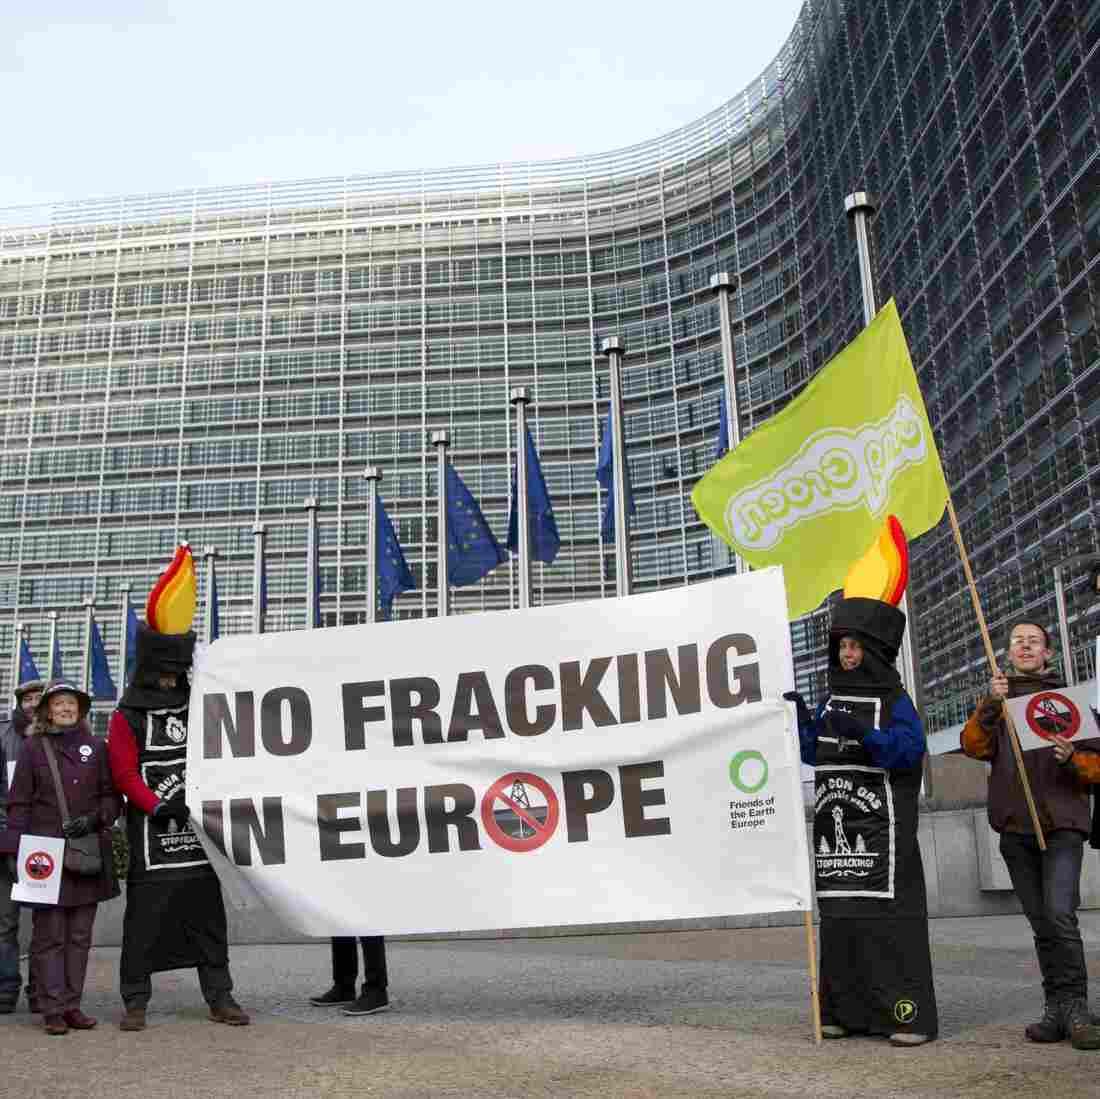 Seeking Energy Independence, Europe Faces Heated Fracking Debate